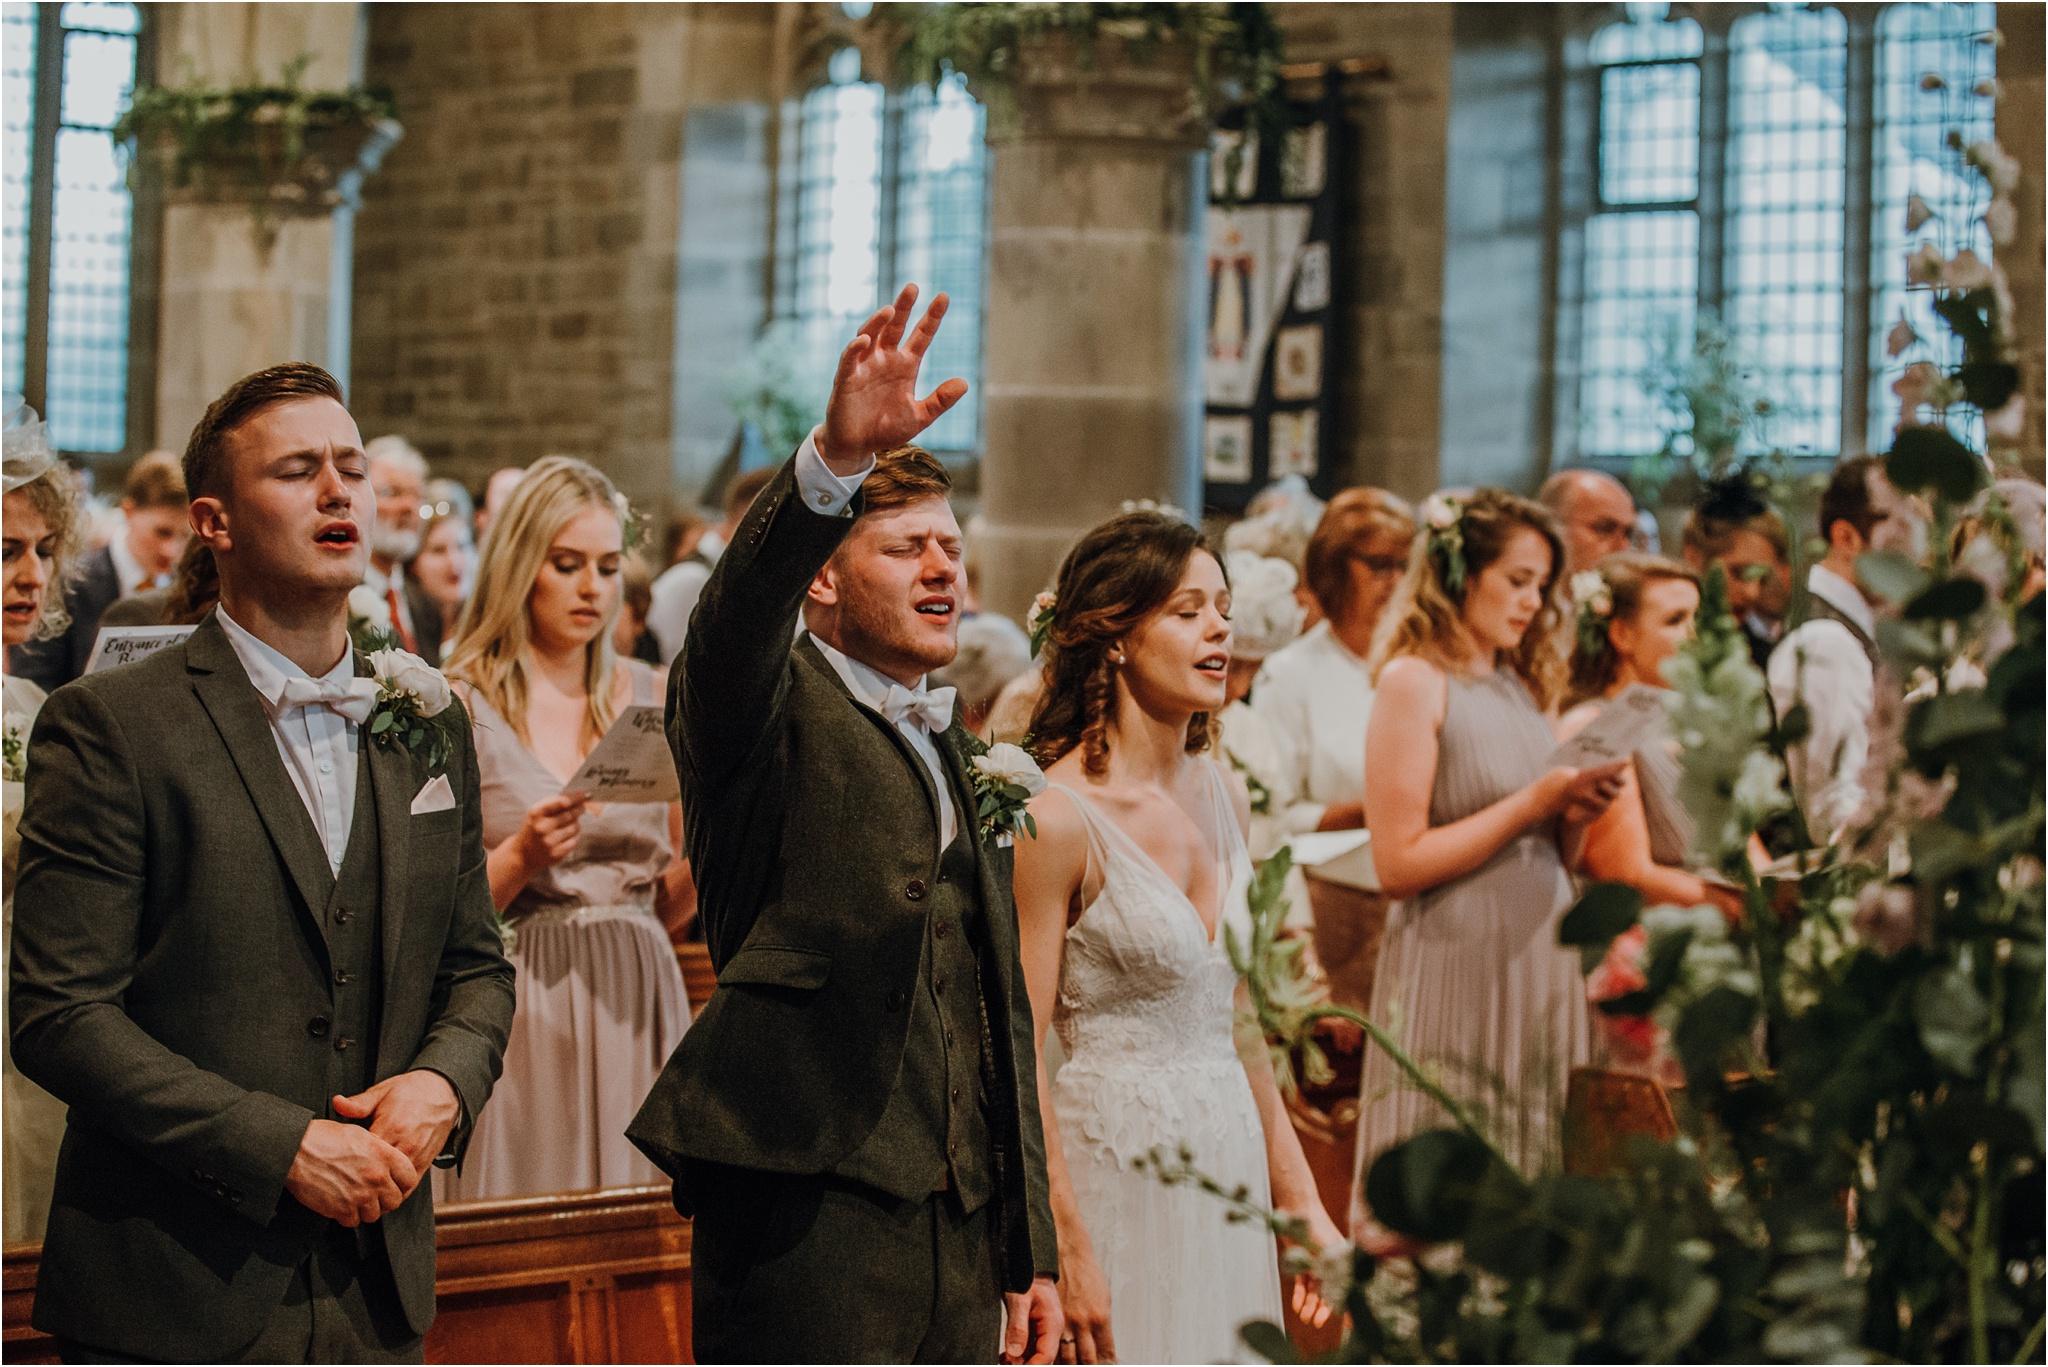 Outdoor-country-wedding-Edinburgh-photographer__0195.jpg